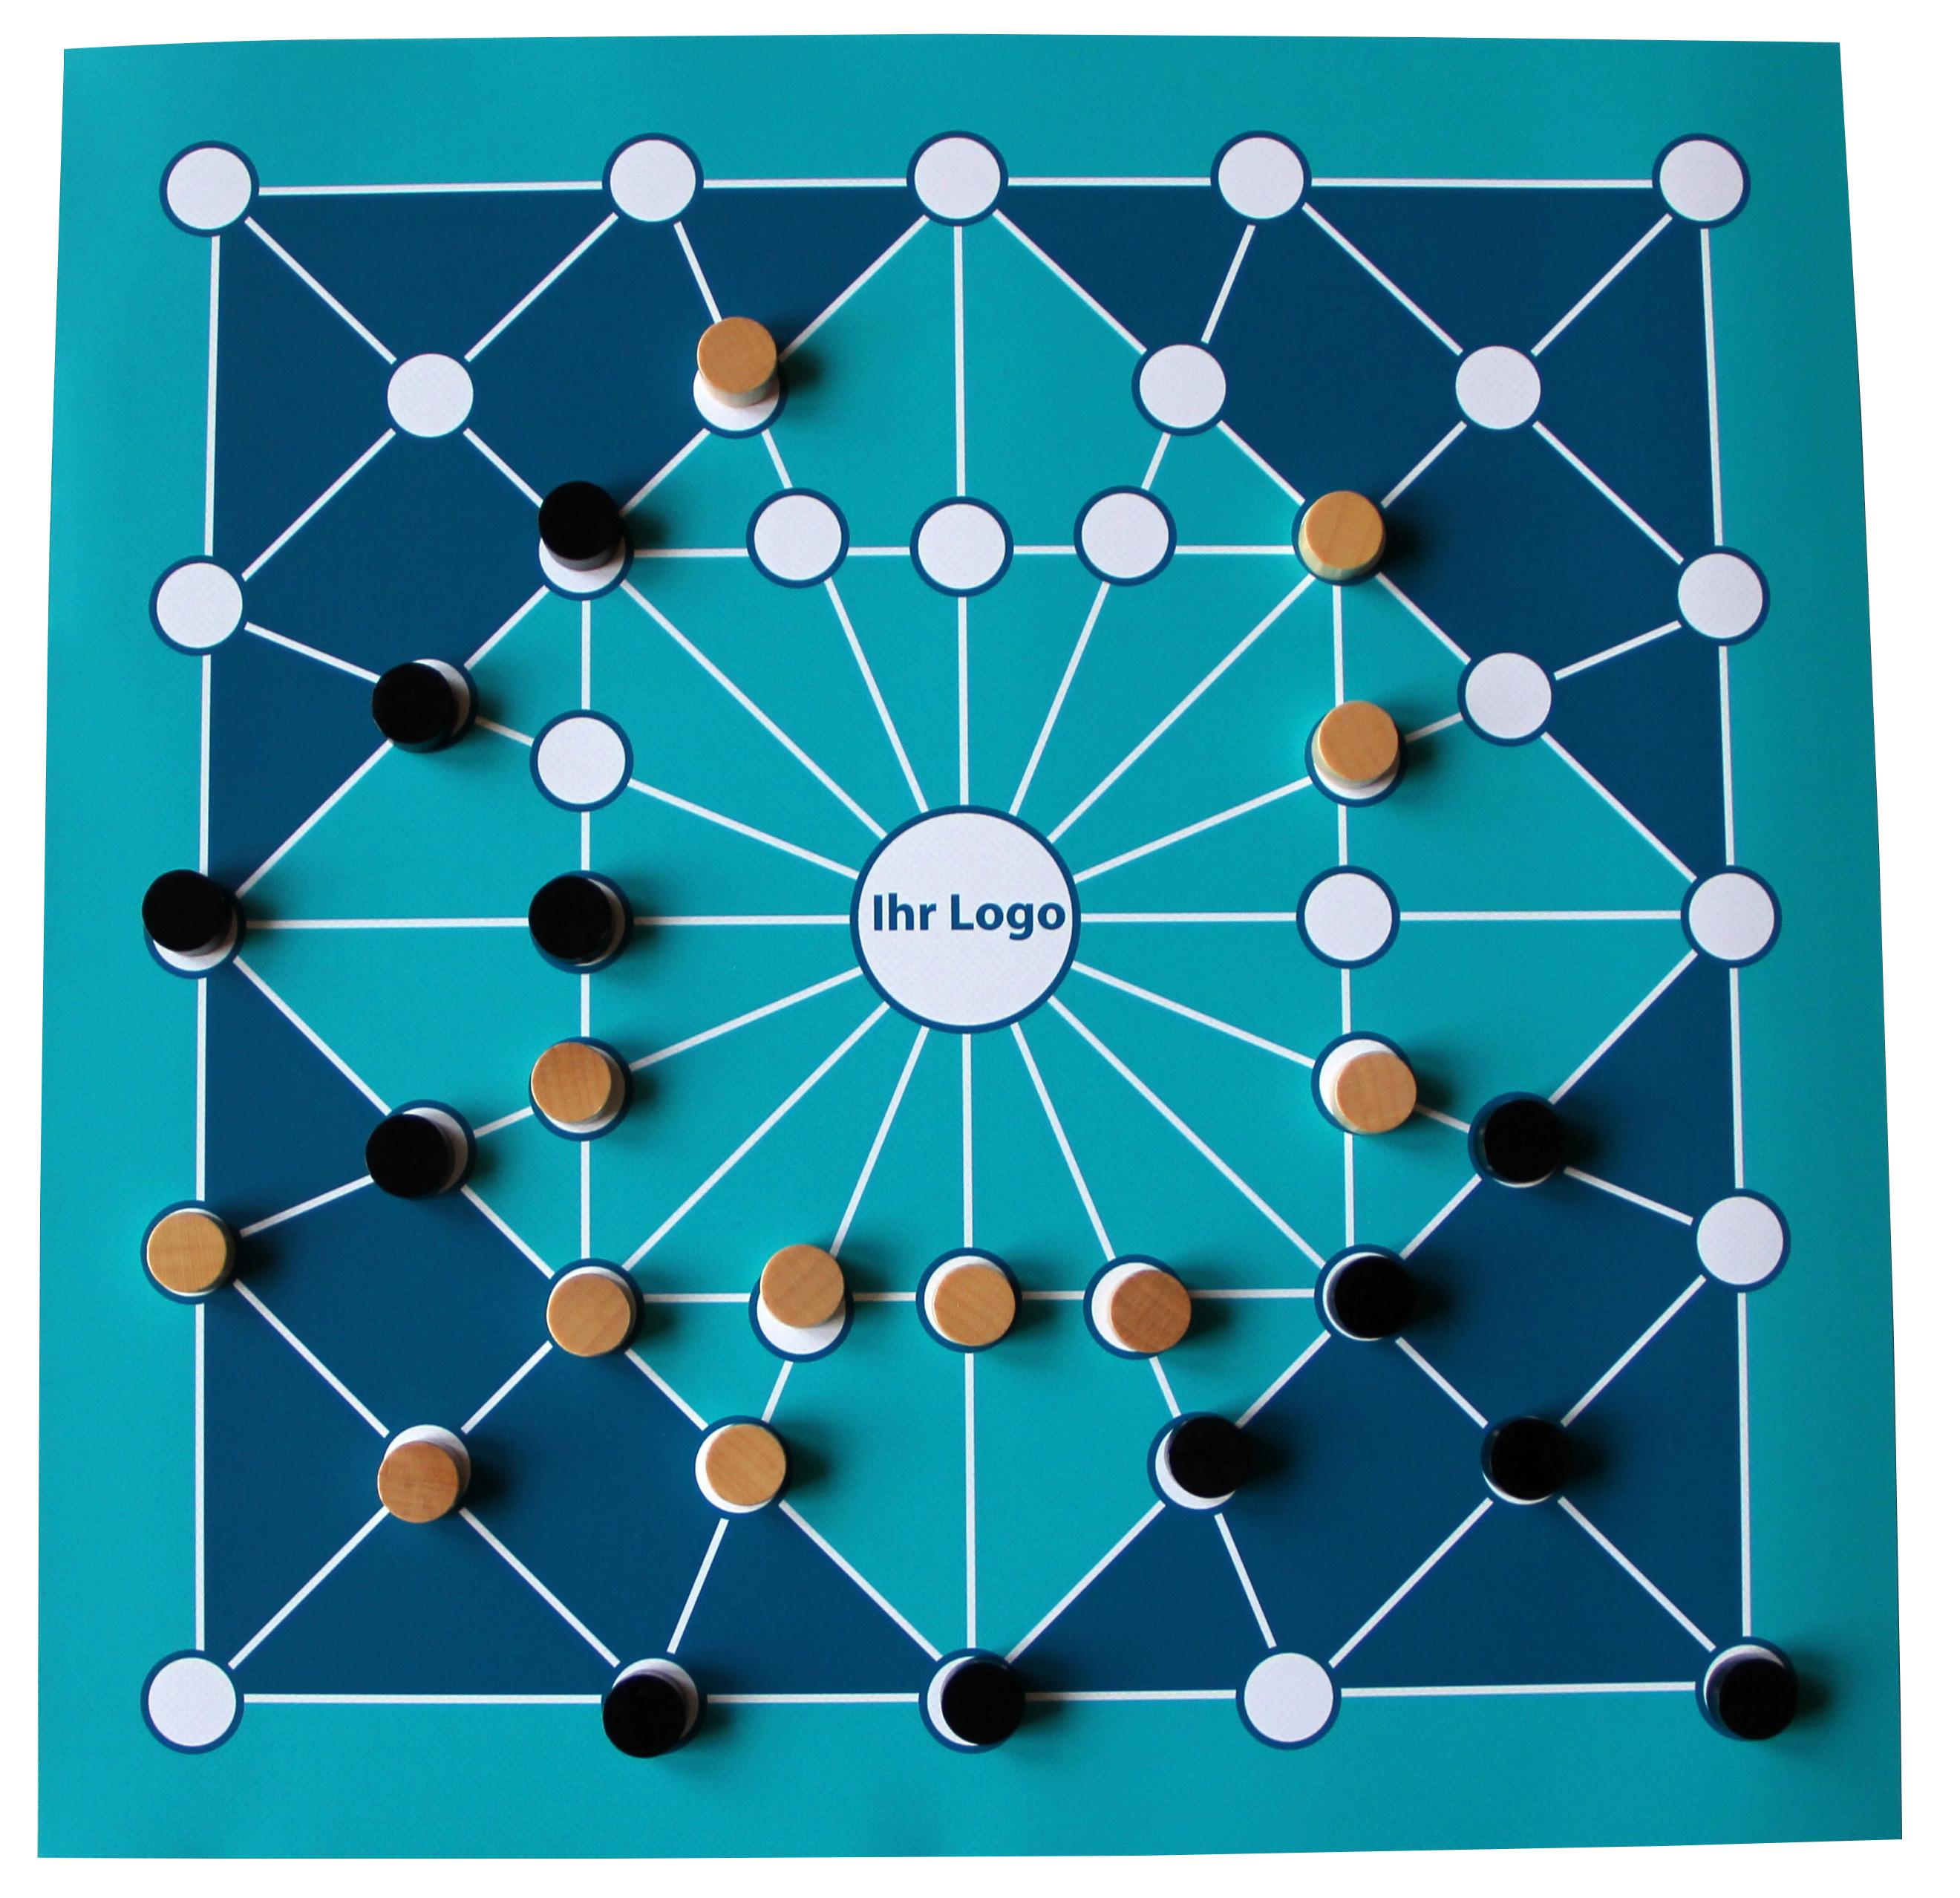 tonkin-blau-ihrlogo-IMG_2297_FREI